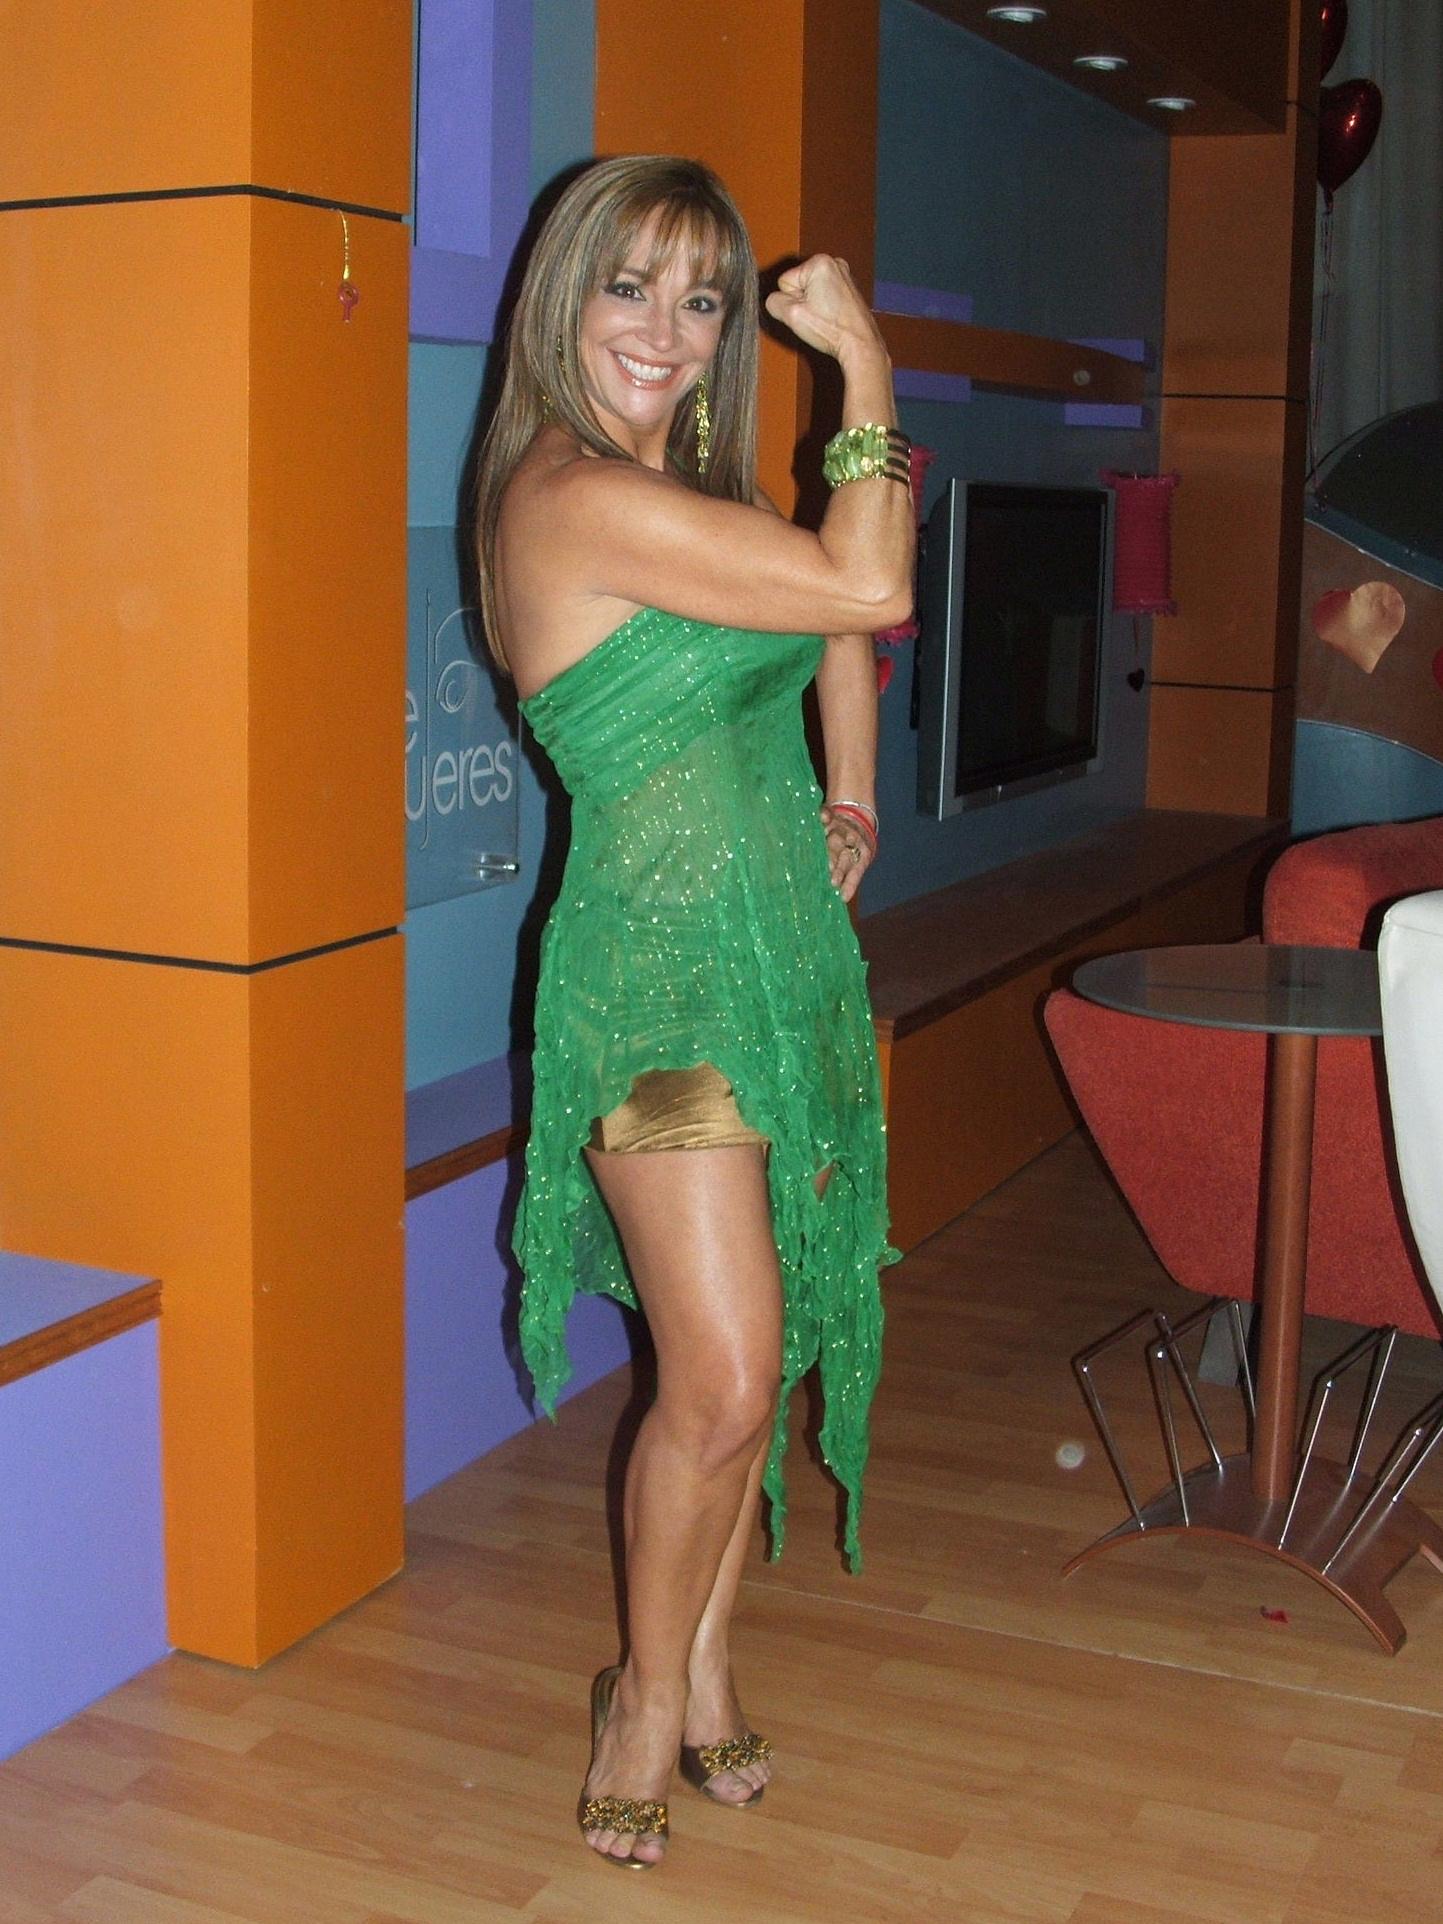 Yolanda Del Rio - Yolanda Del Rio Con La Banda Sinaloense